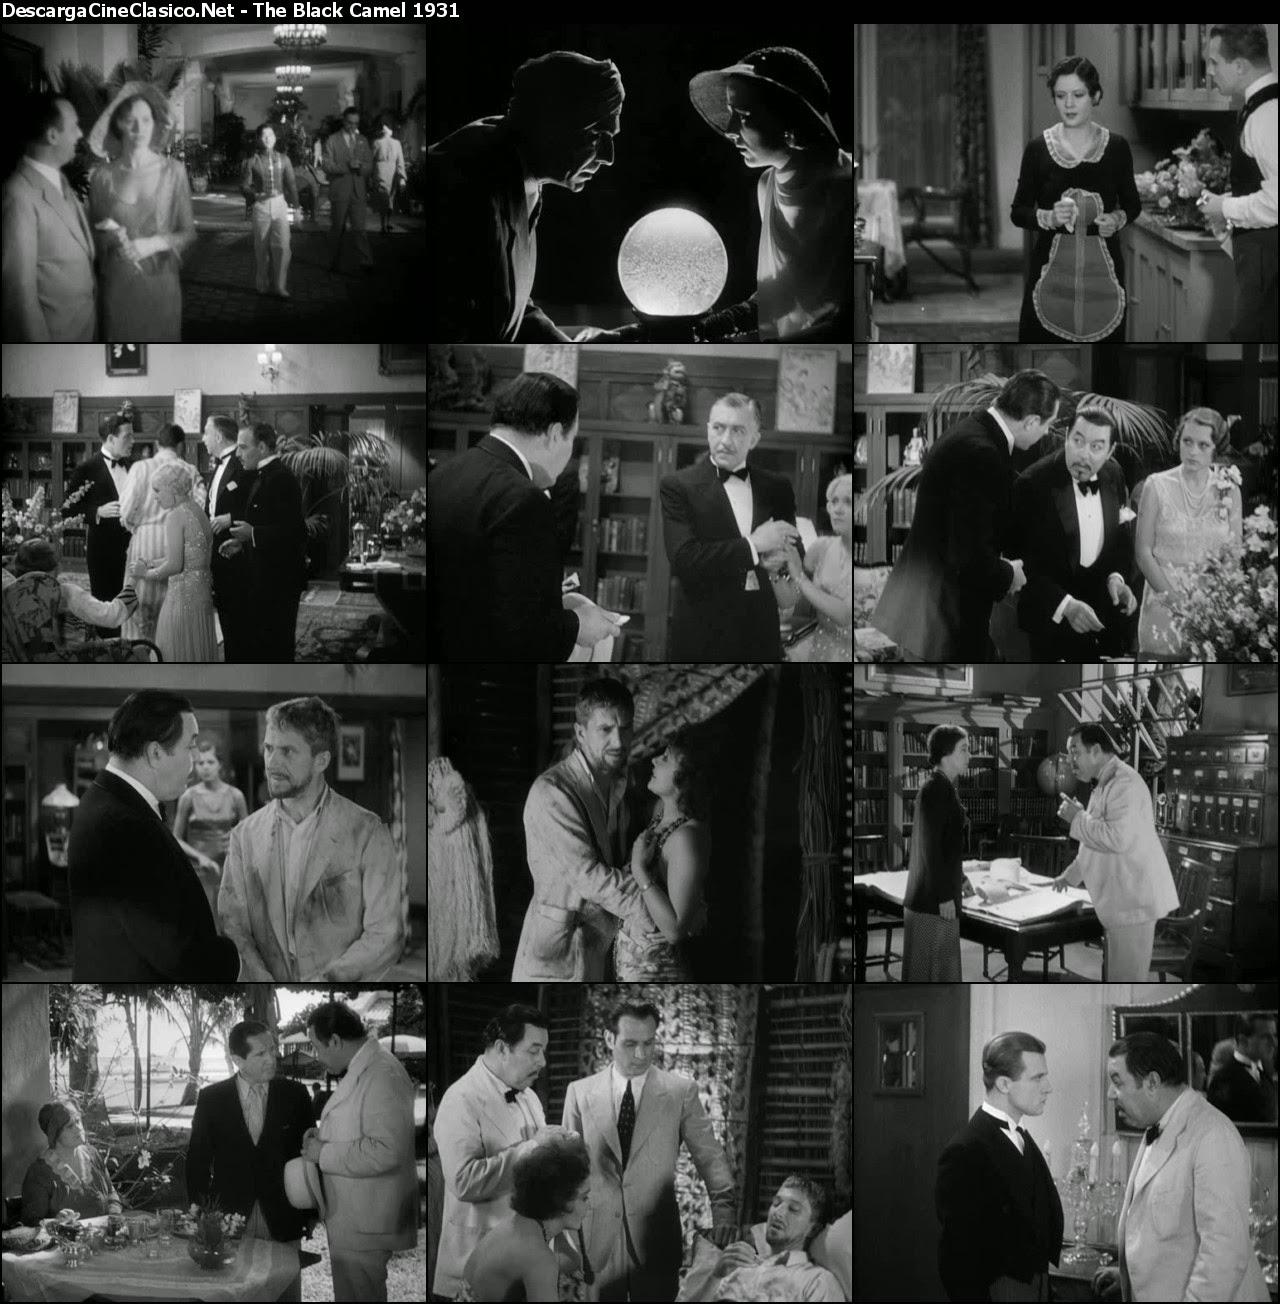 Charlie Chan: The Black Camel (1931)